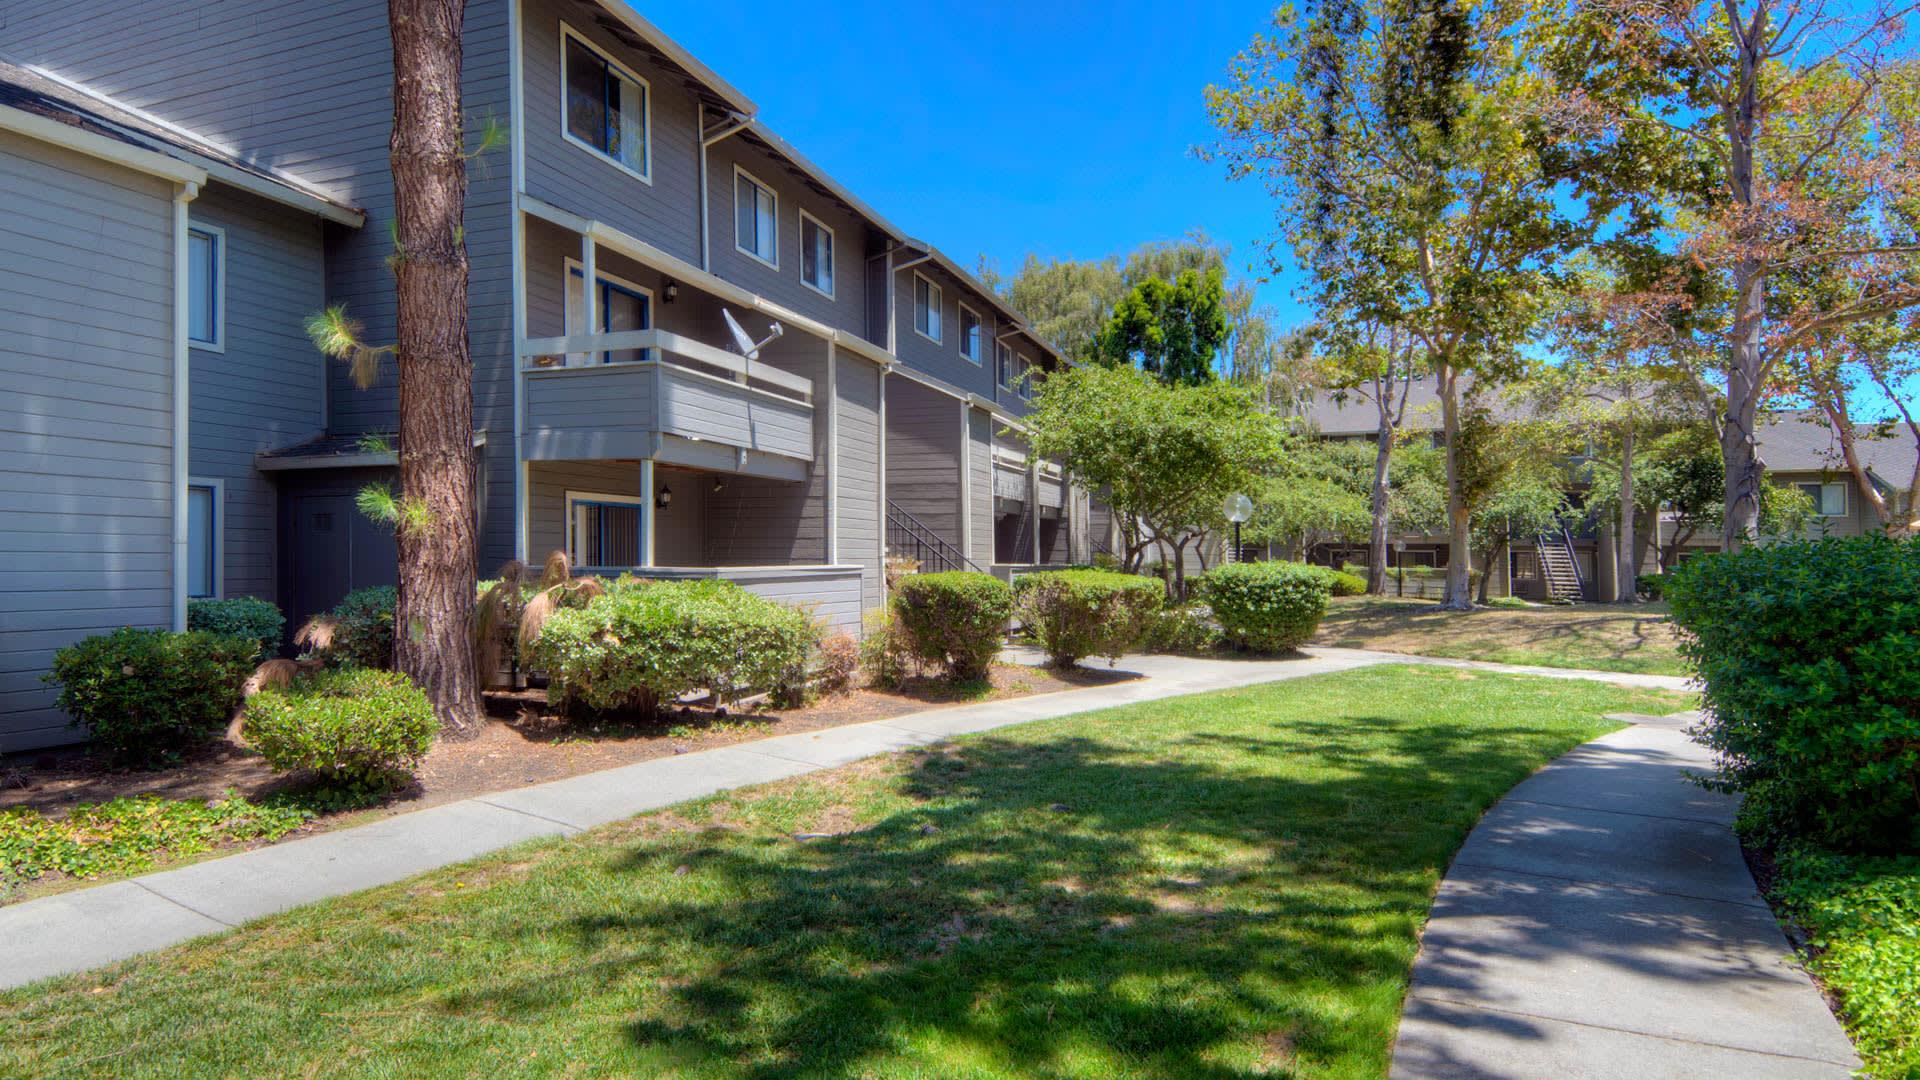 Briarwood Apartments - Exterior